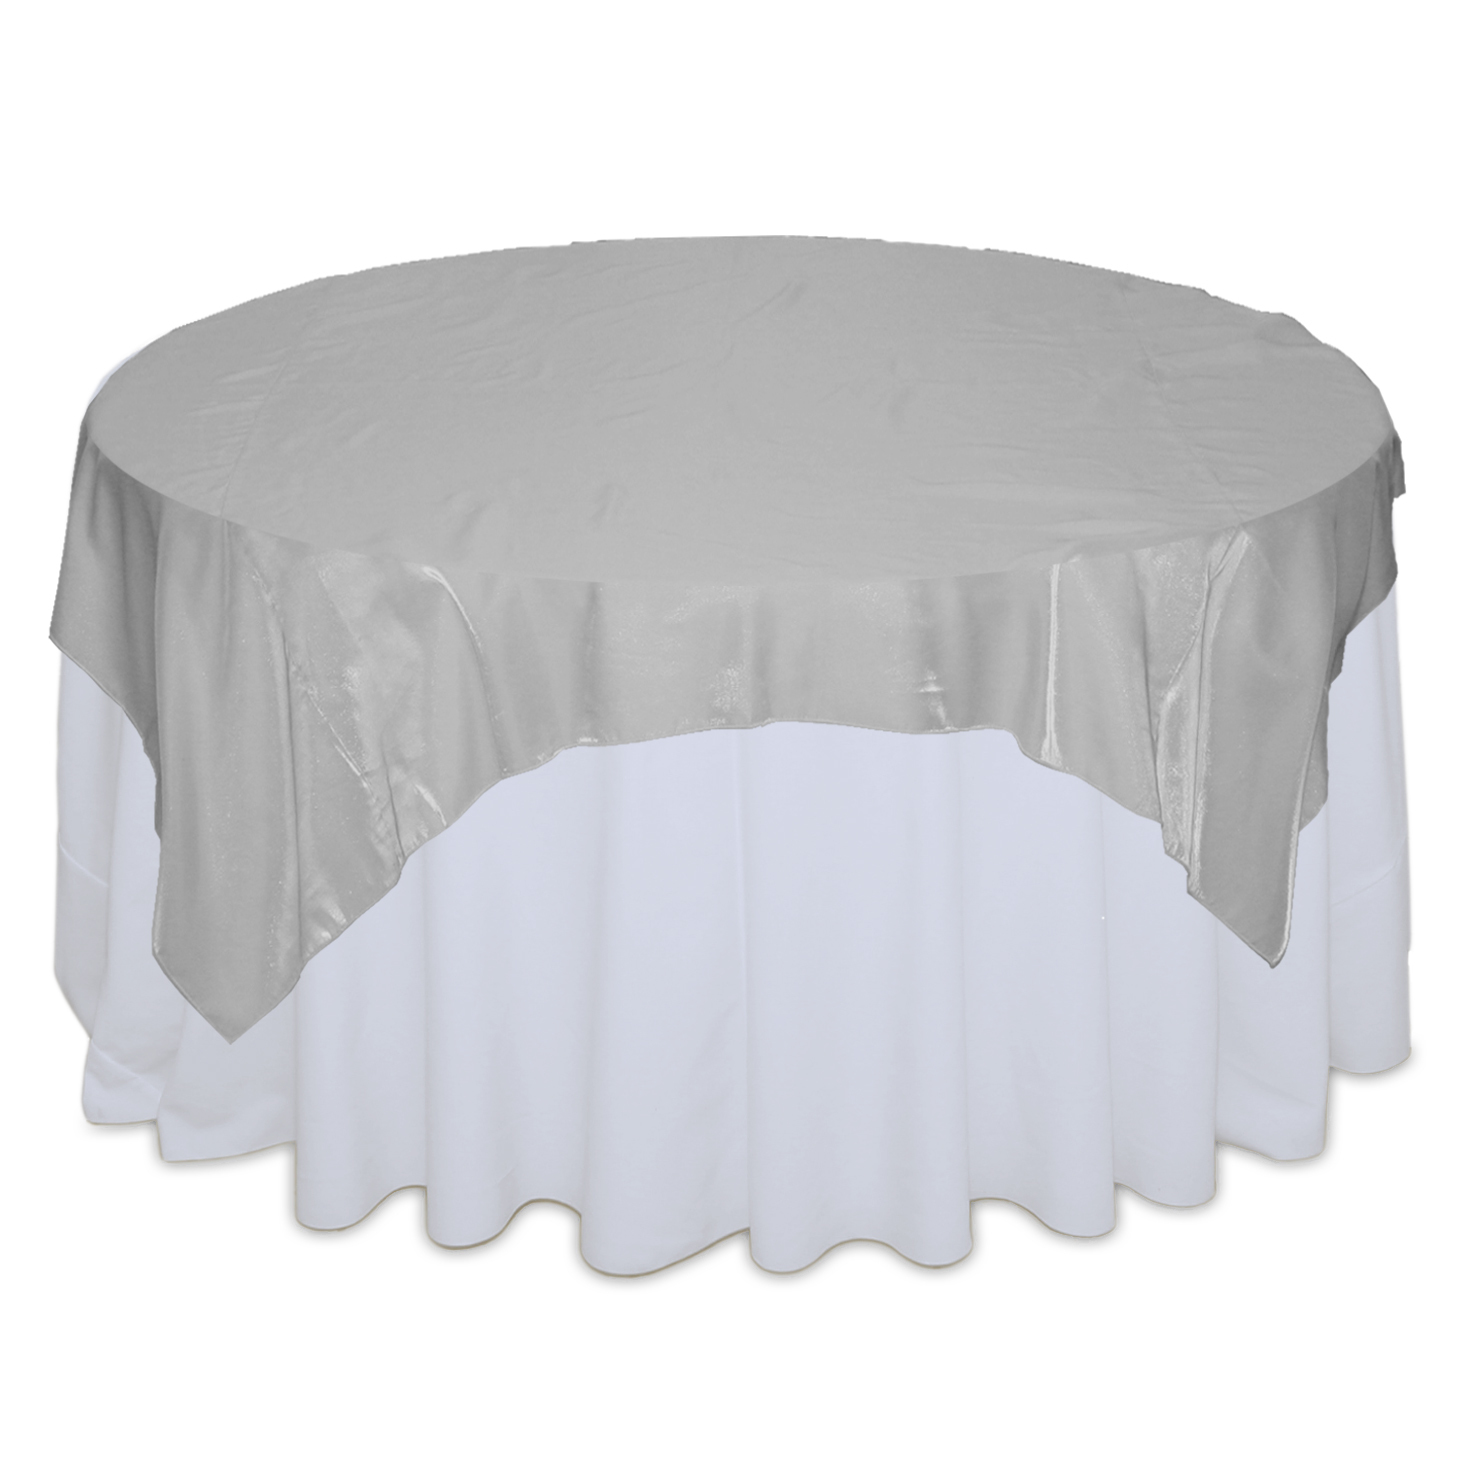 Silver Organza Satin Table Overlay Rental Silver Organza Satin Overlay Rental